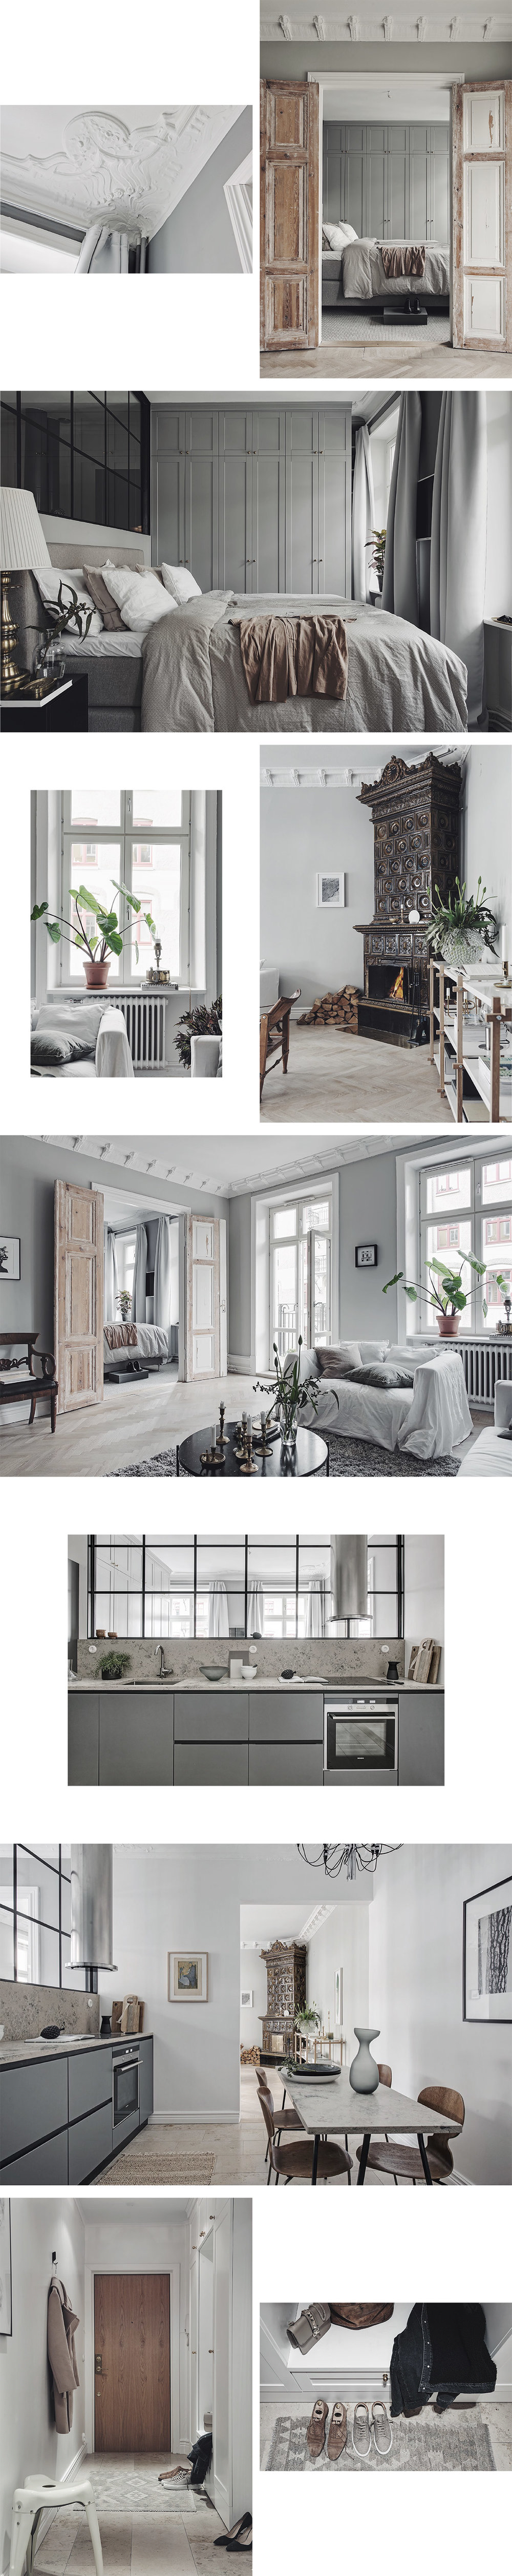 Bilder via Alvhem foto Fredrik J Karlsson